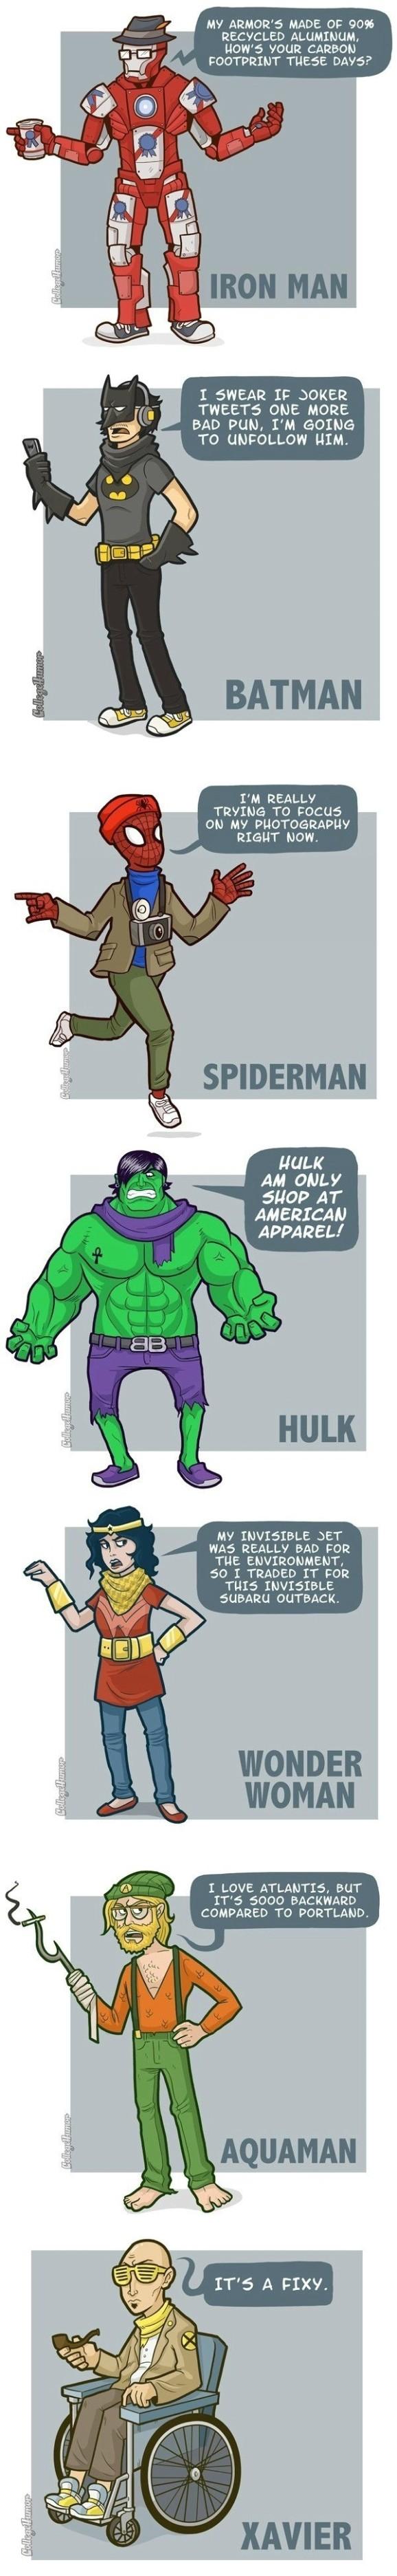 Hipster Superheroes = douche Superheroes